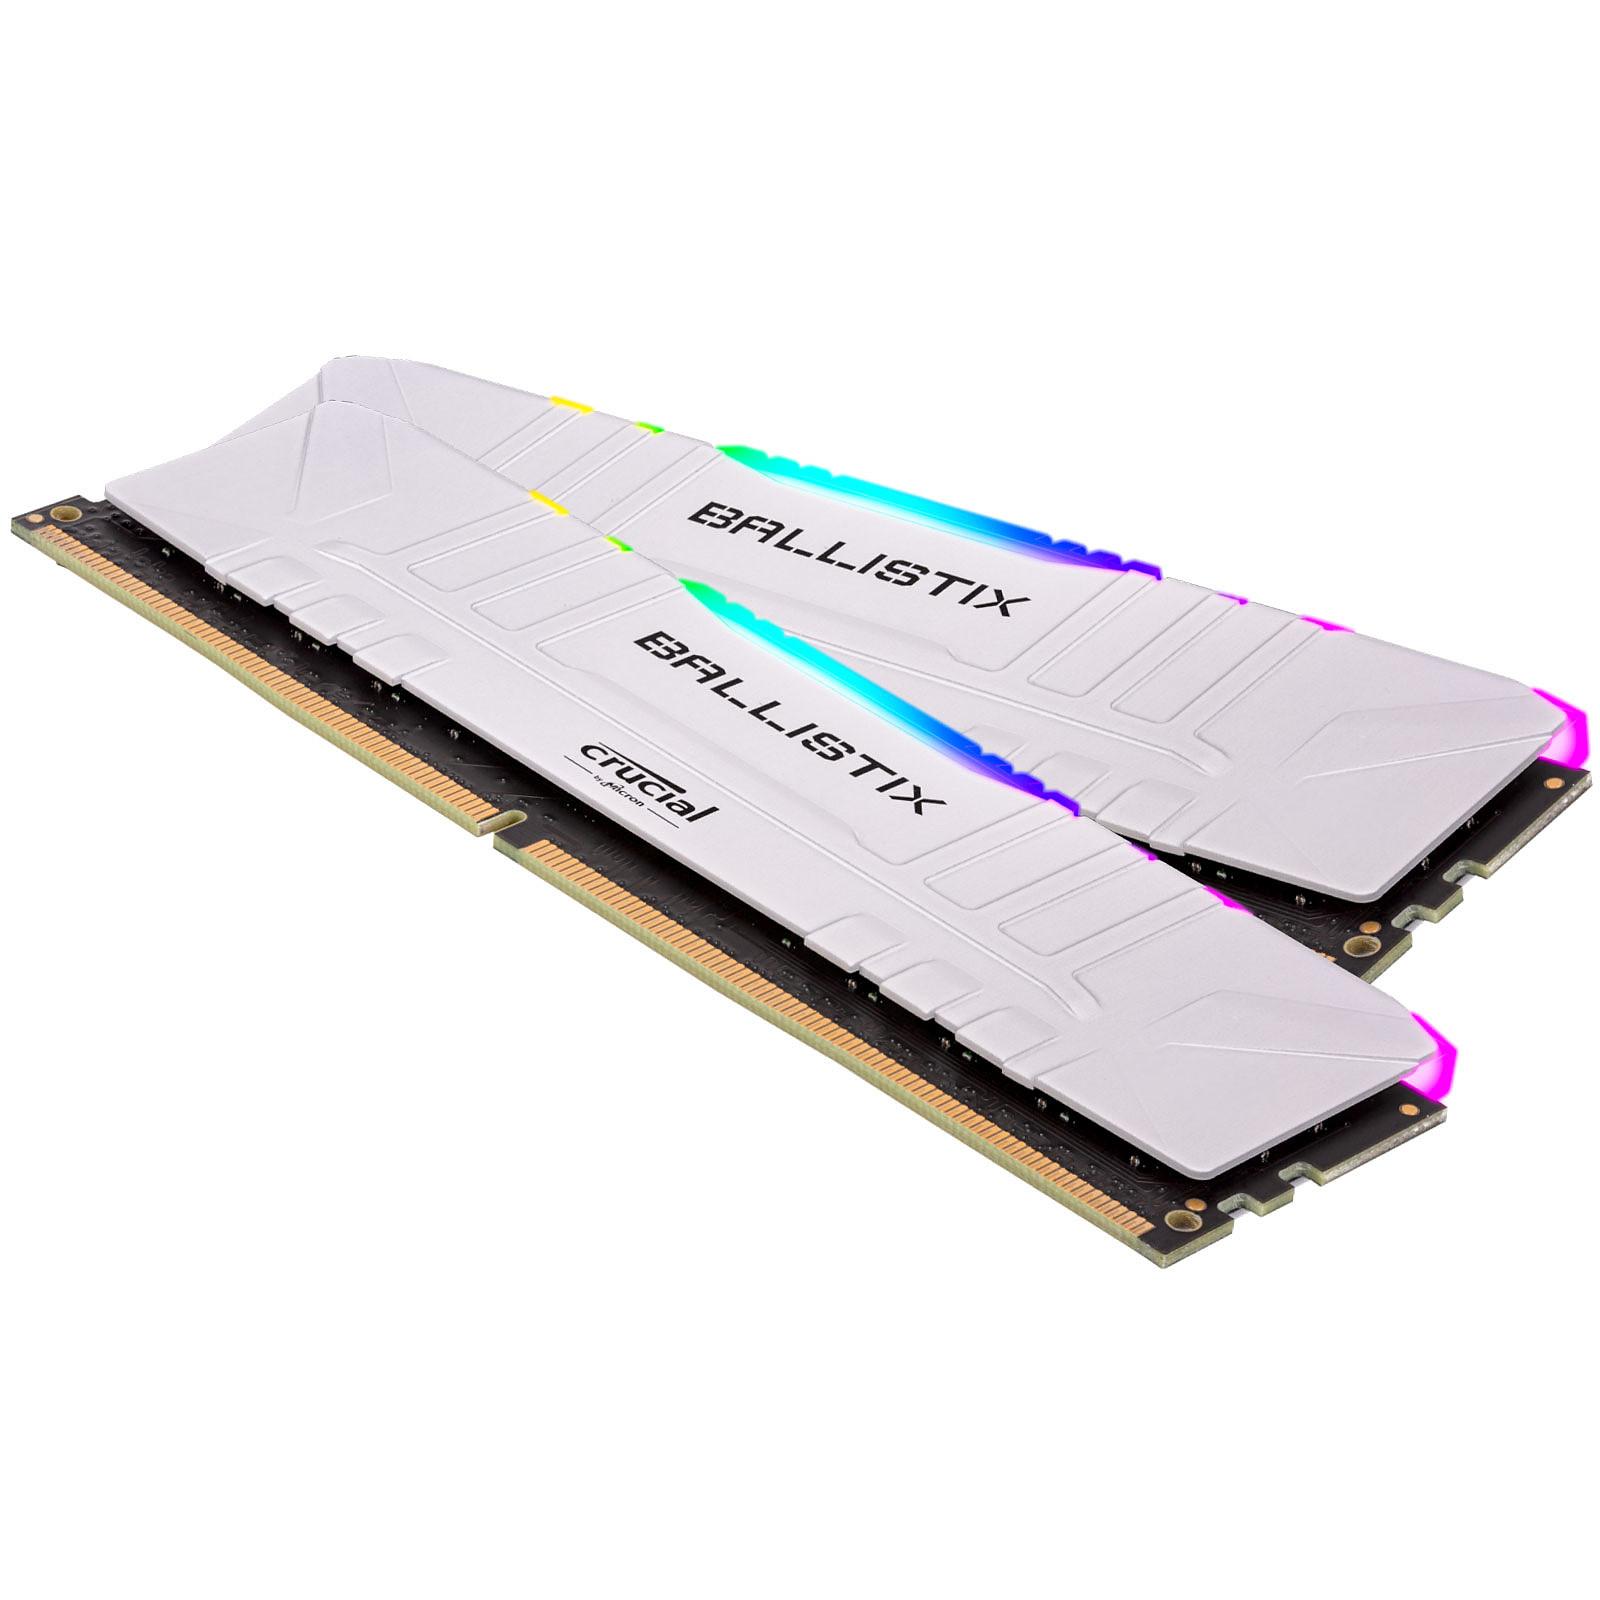 Ballistix White RGB DDR4 32 Go (2 x 16 Go) 3600 MHz CL16